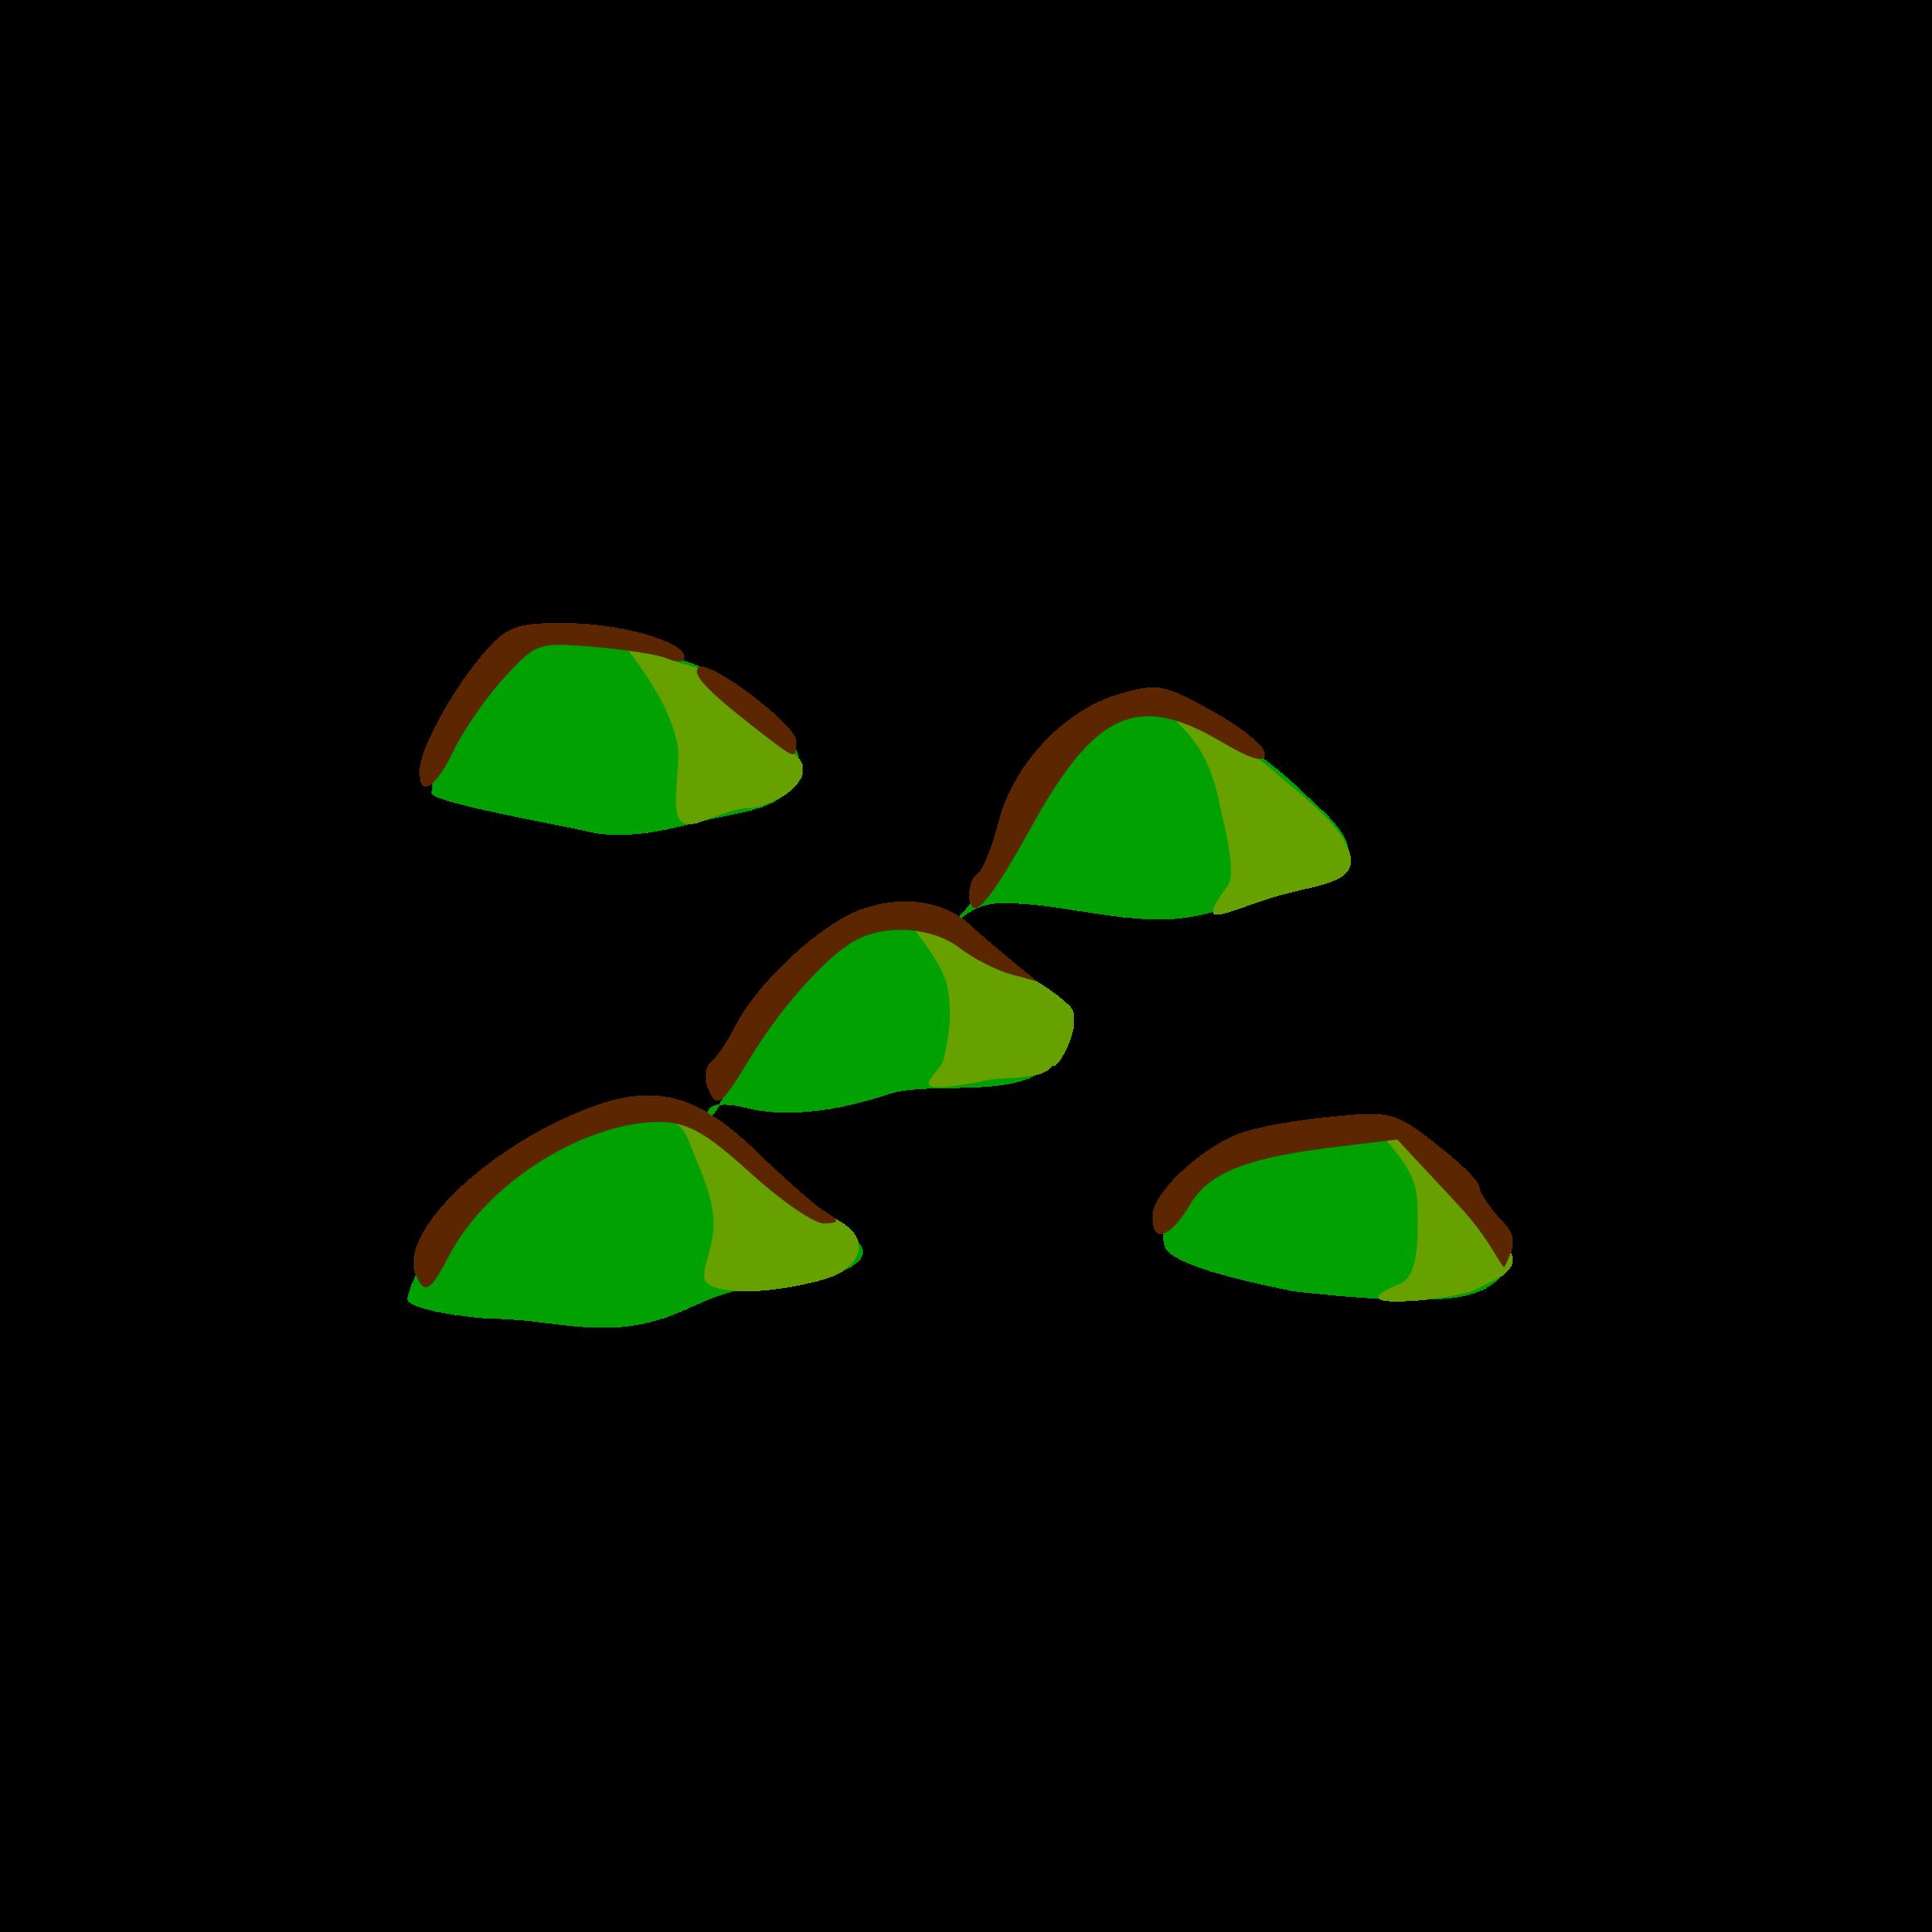 Rpg map symbols hills. Hill clipart small hill